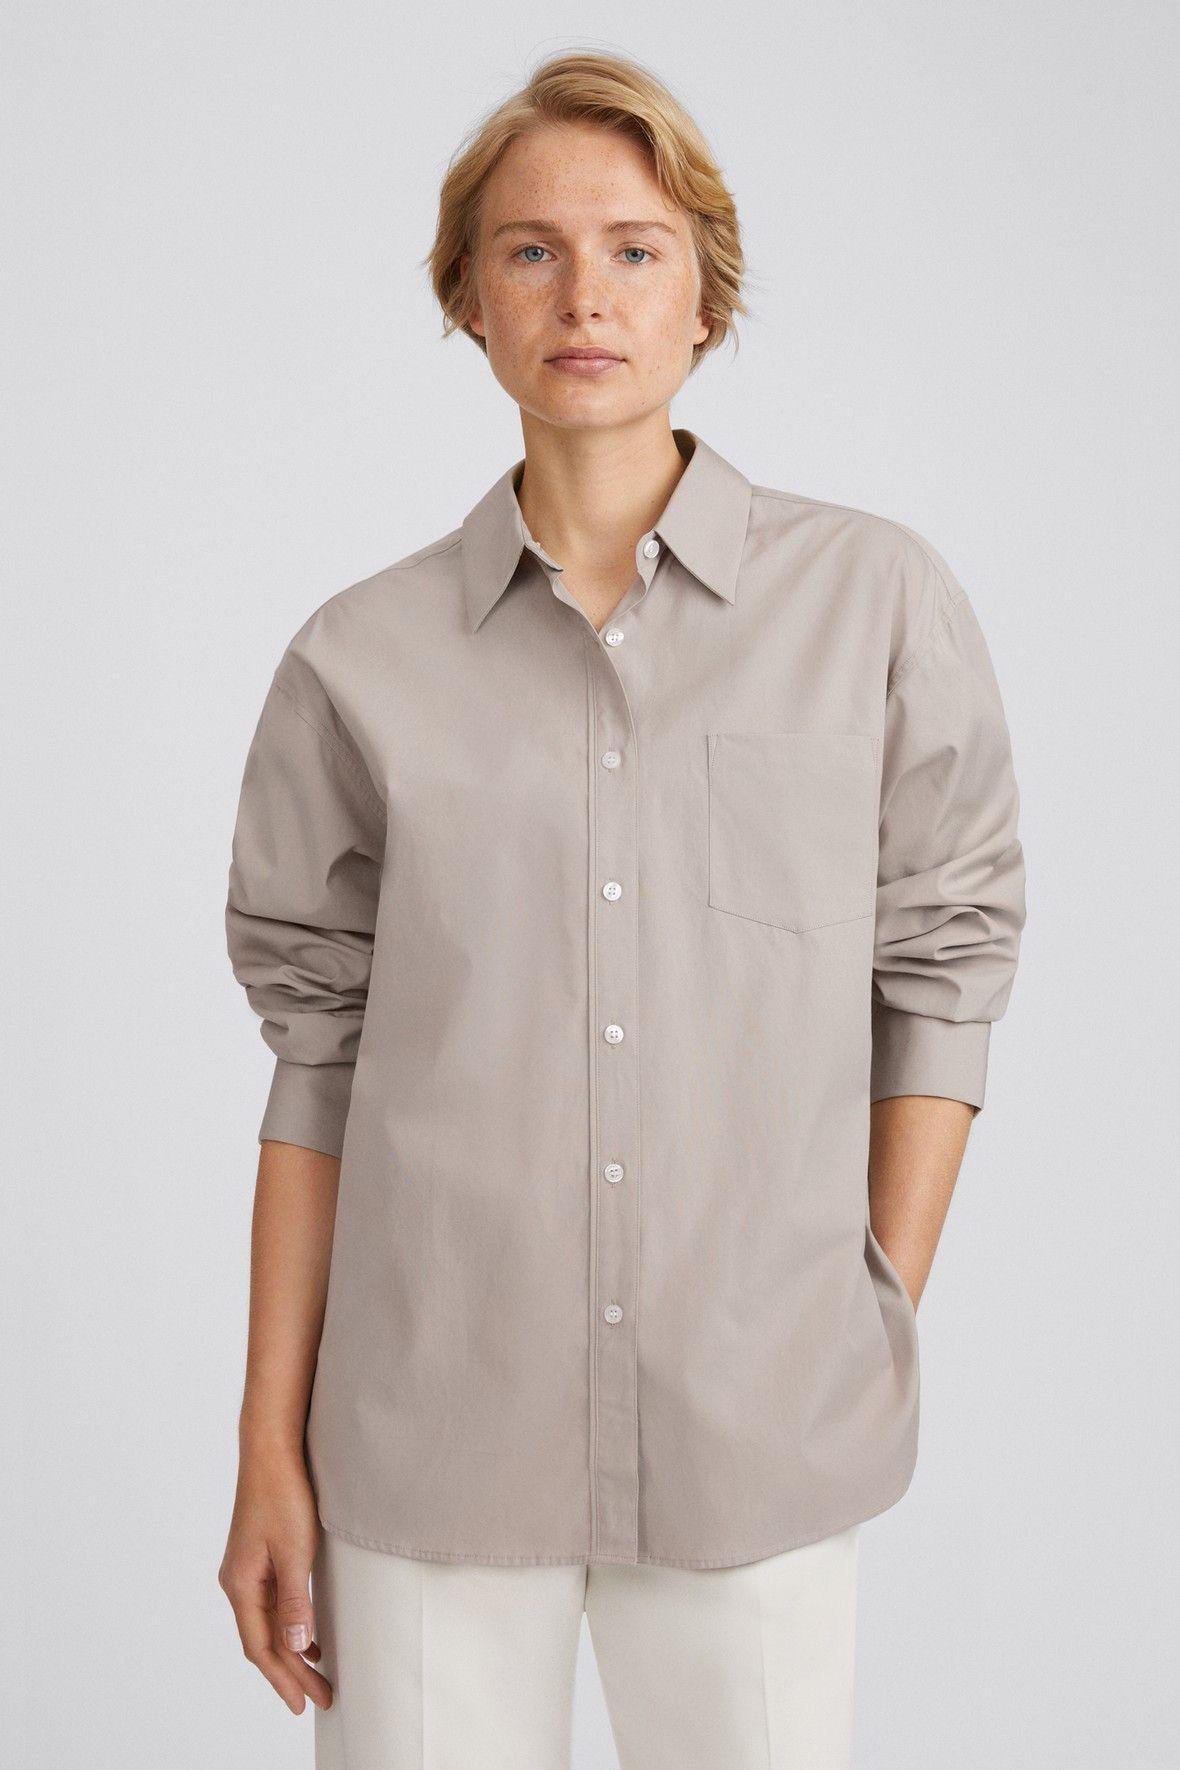 Scandinavian Clothing Brands Top 10 Modern Minimal In 2020 Clothing Brand Shirts Cotton Shirt